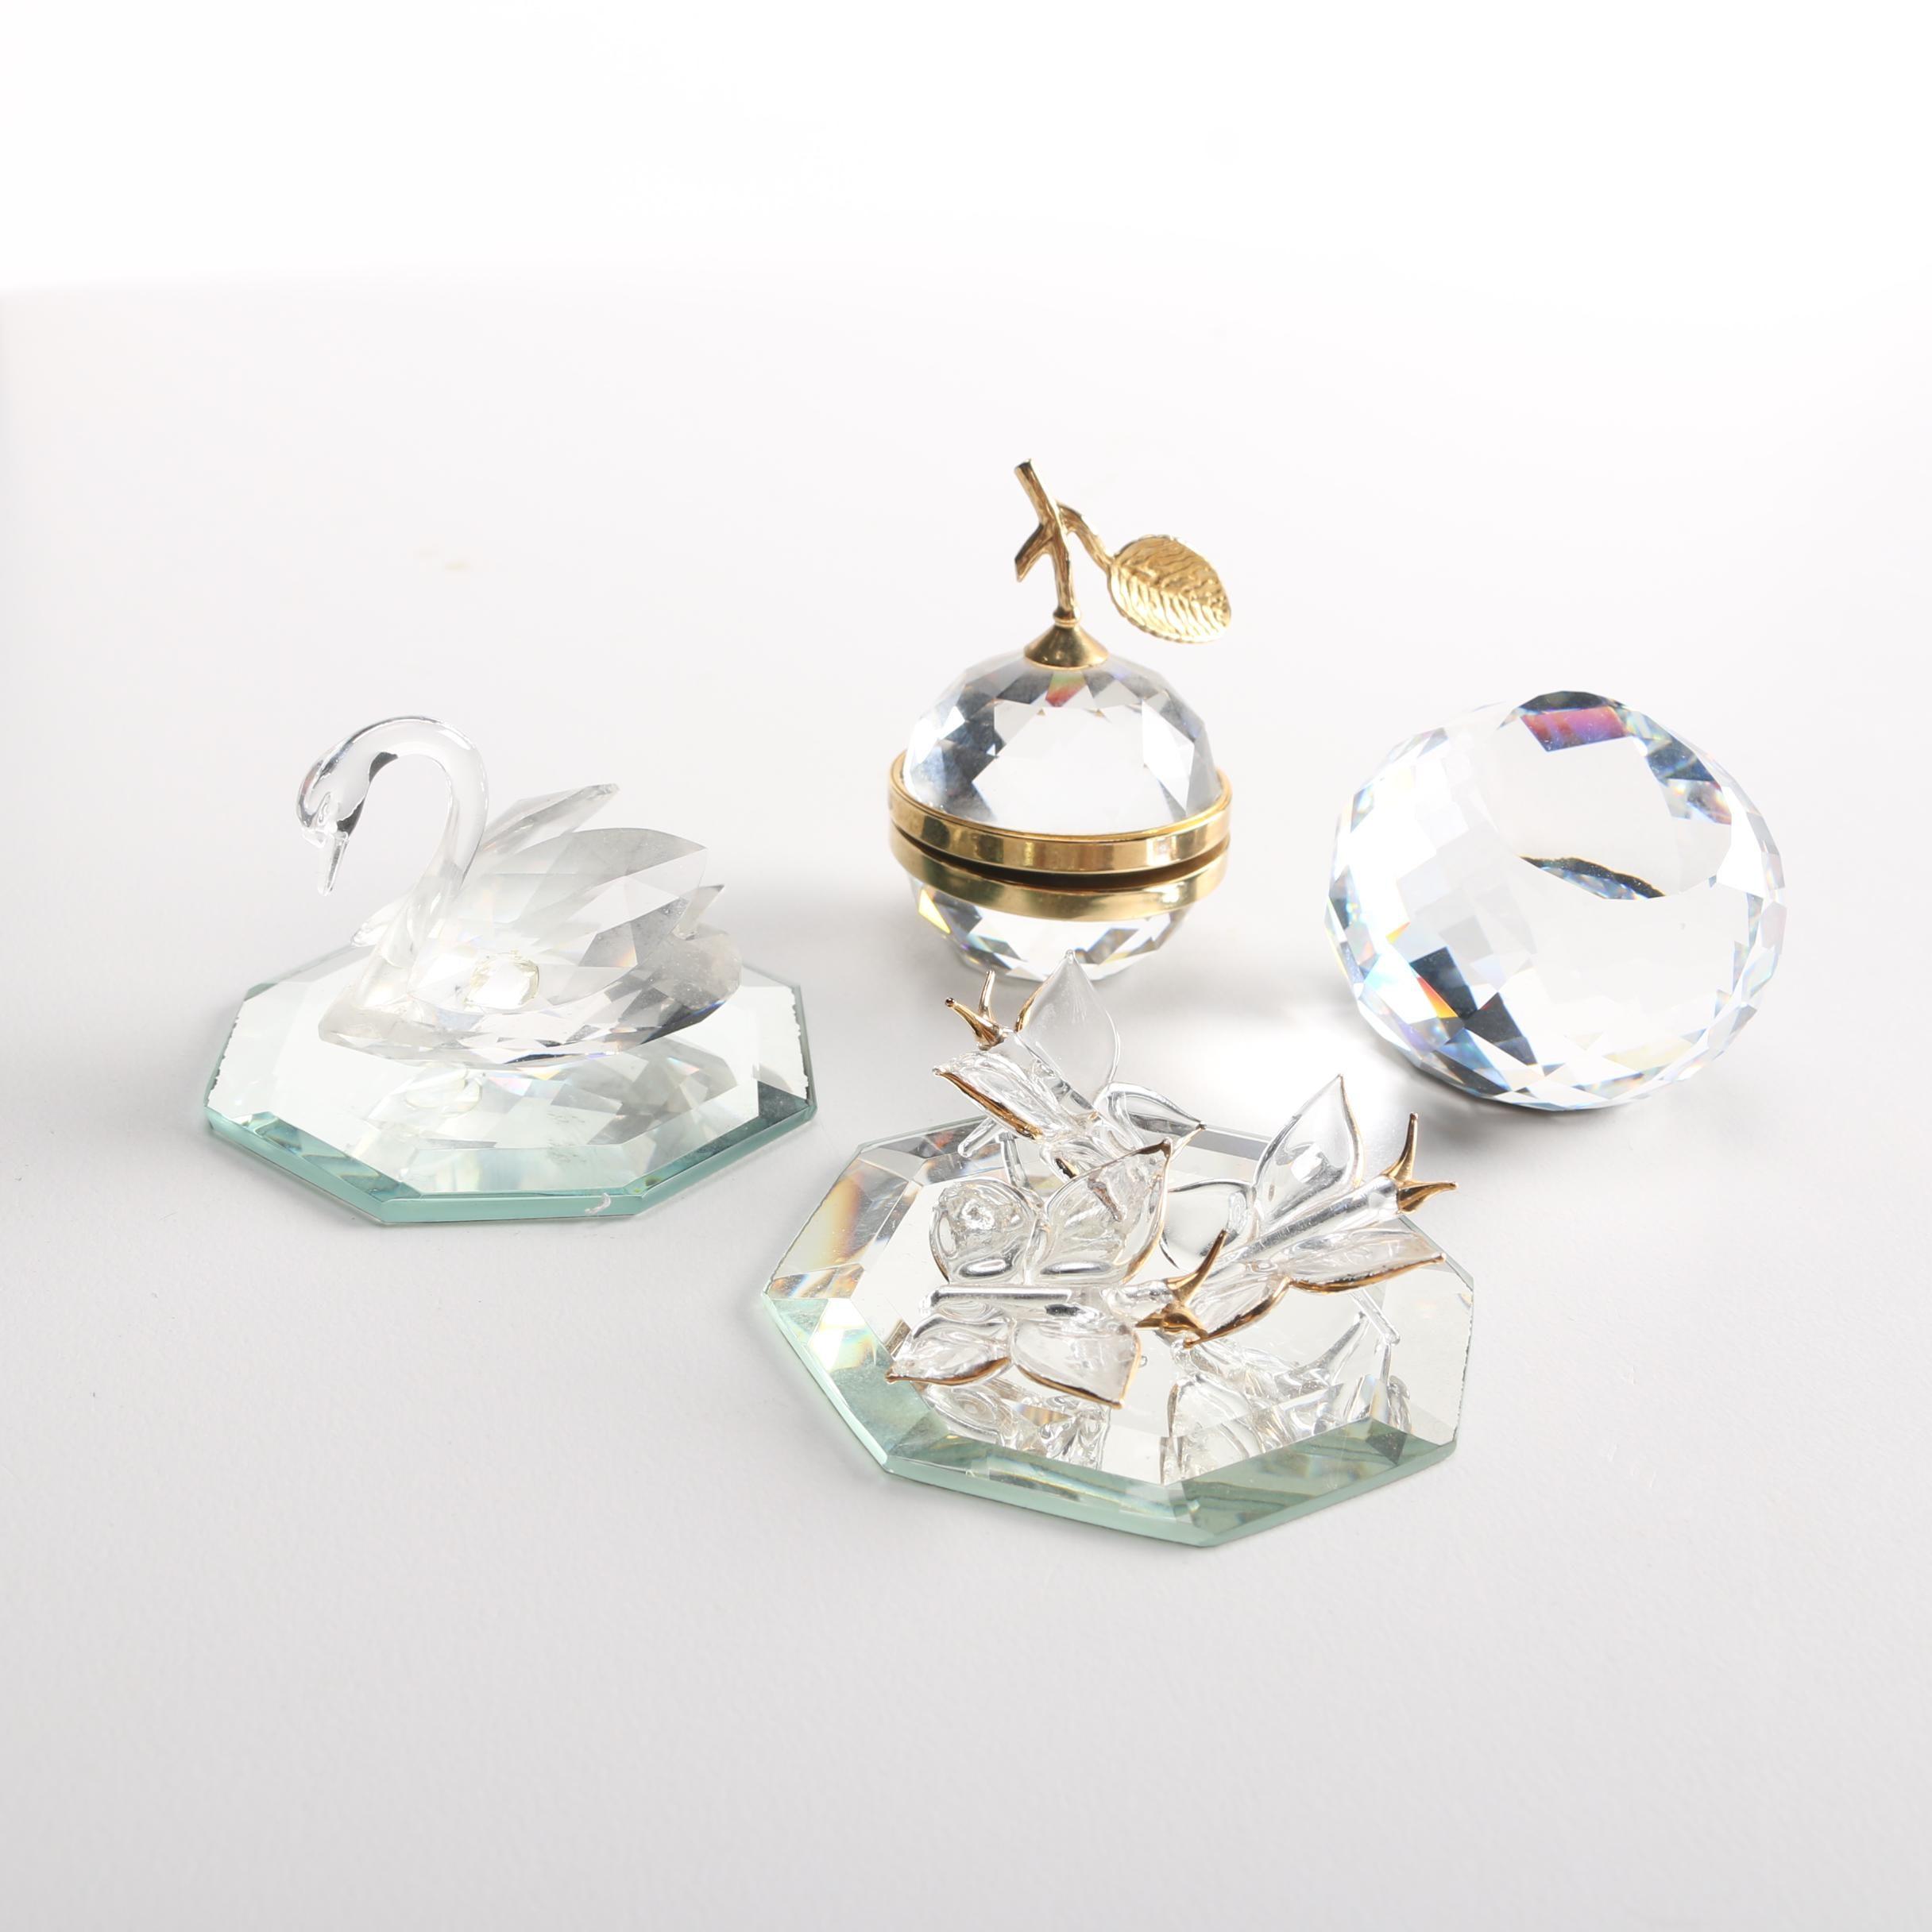 Crystal Figurines Featuring Swarovski